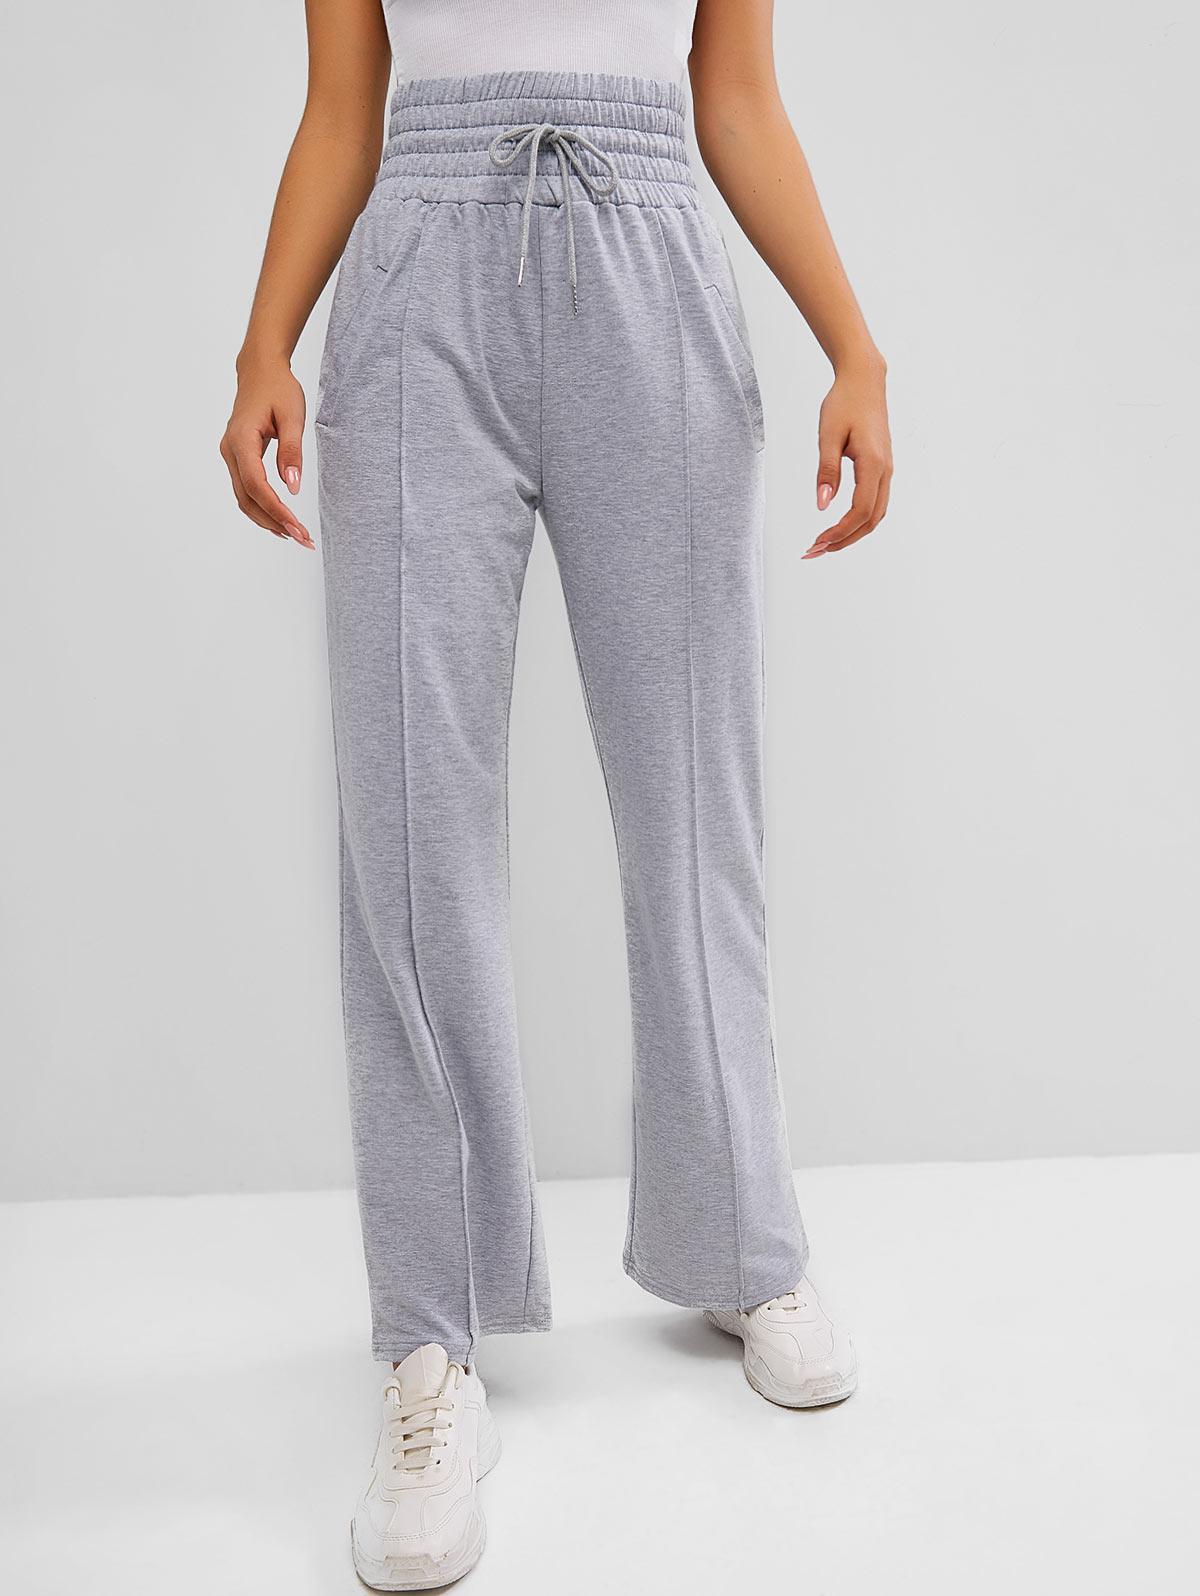 High Waisted Drawstring Pintuck Straight Sweatpants